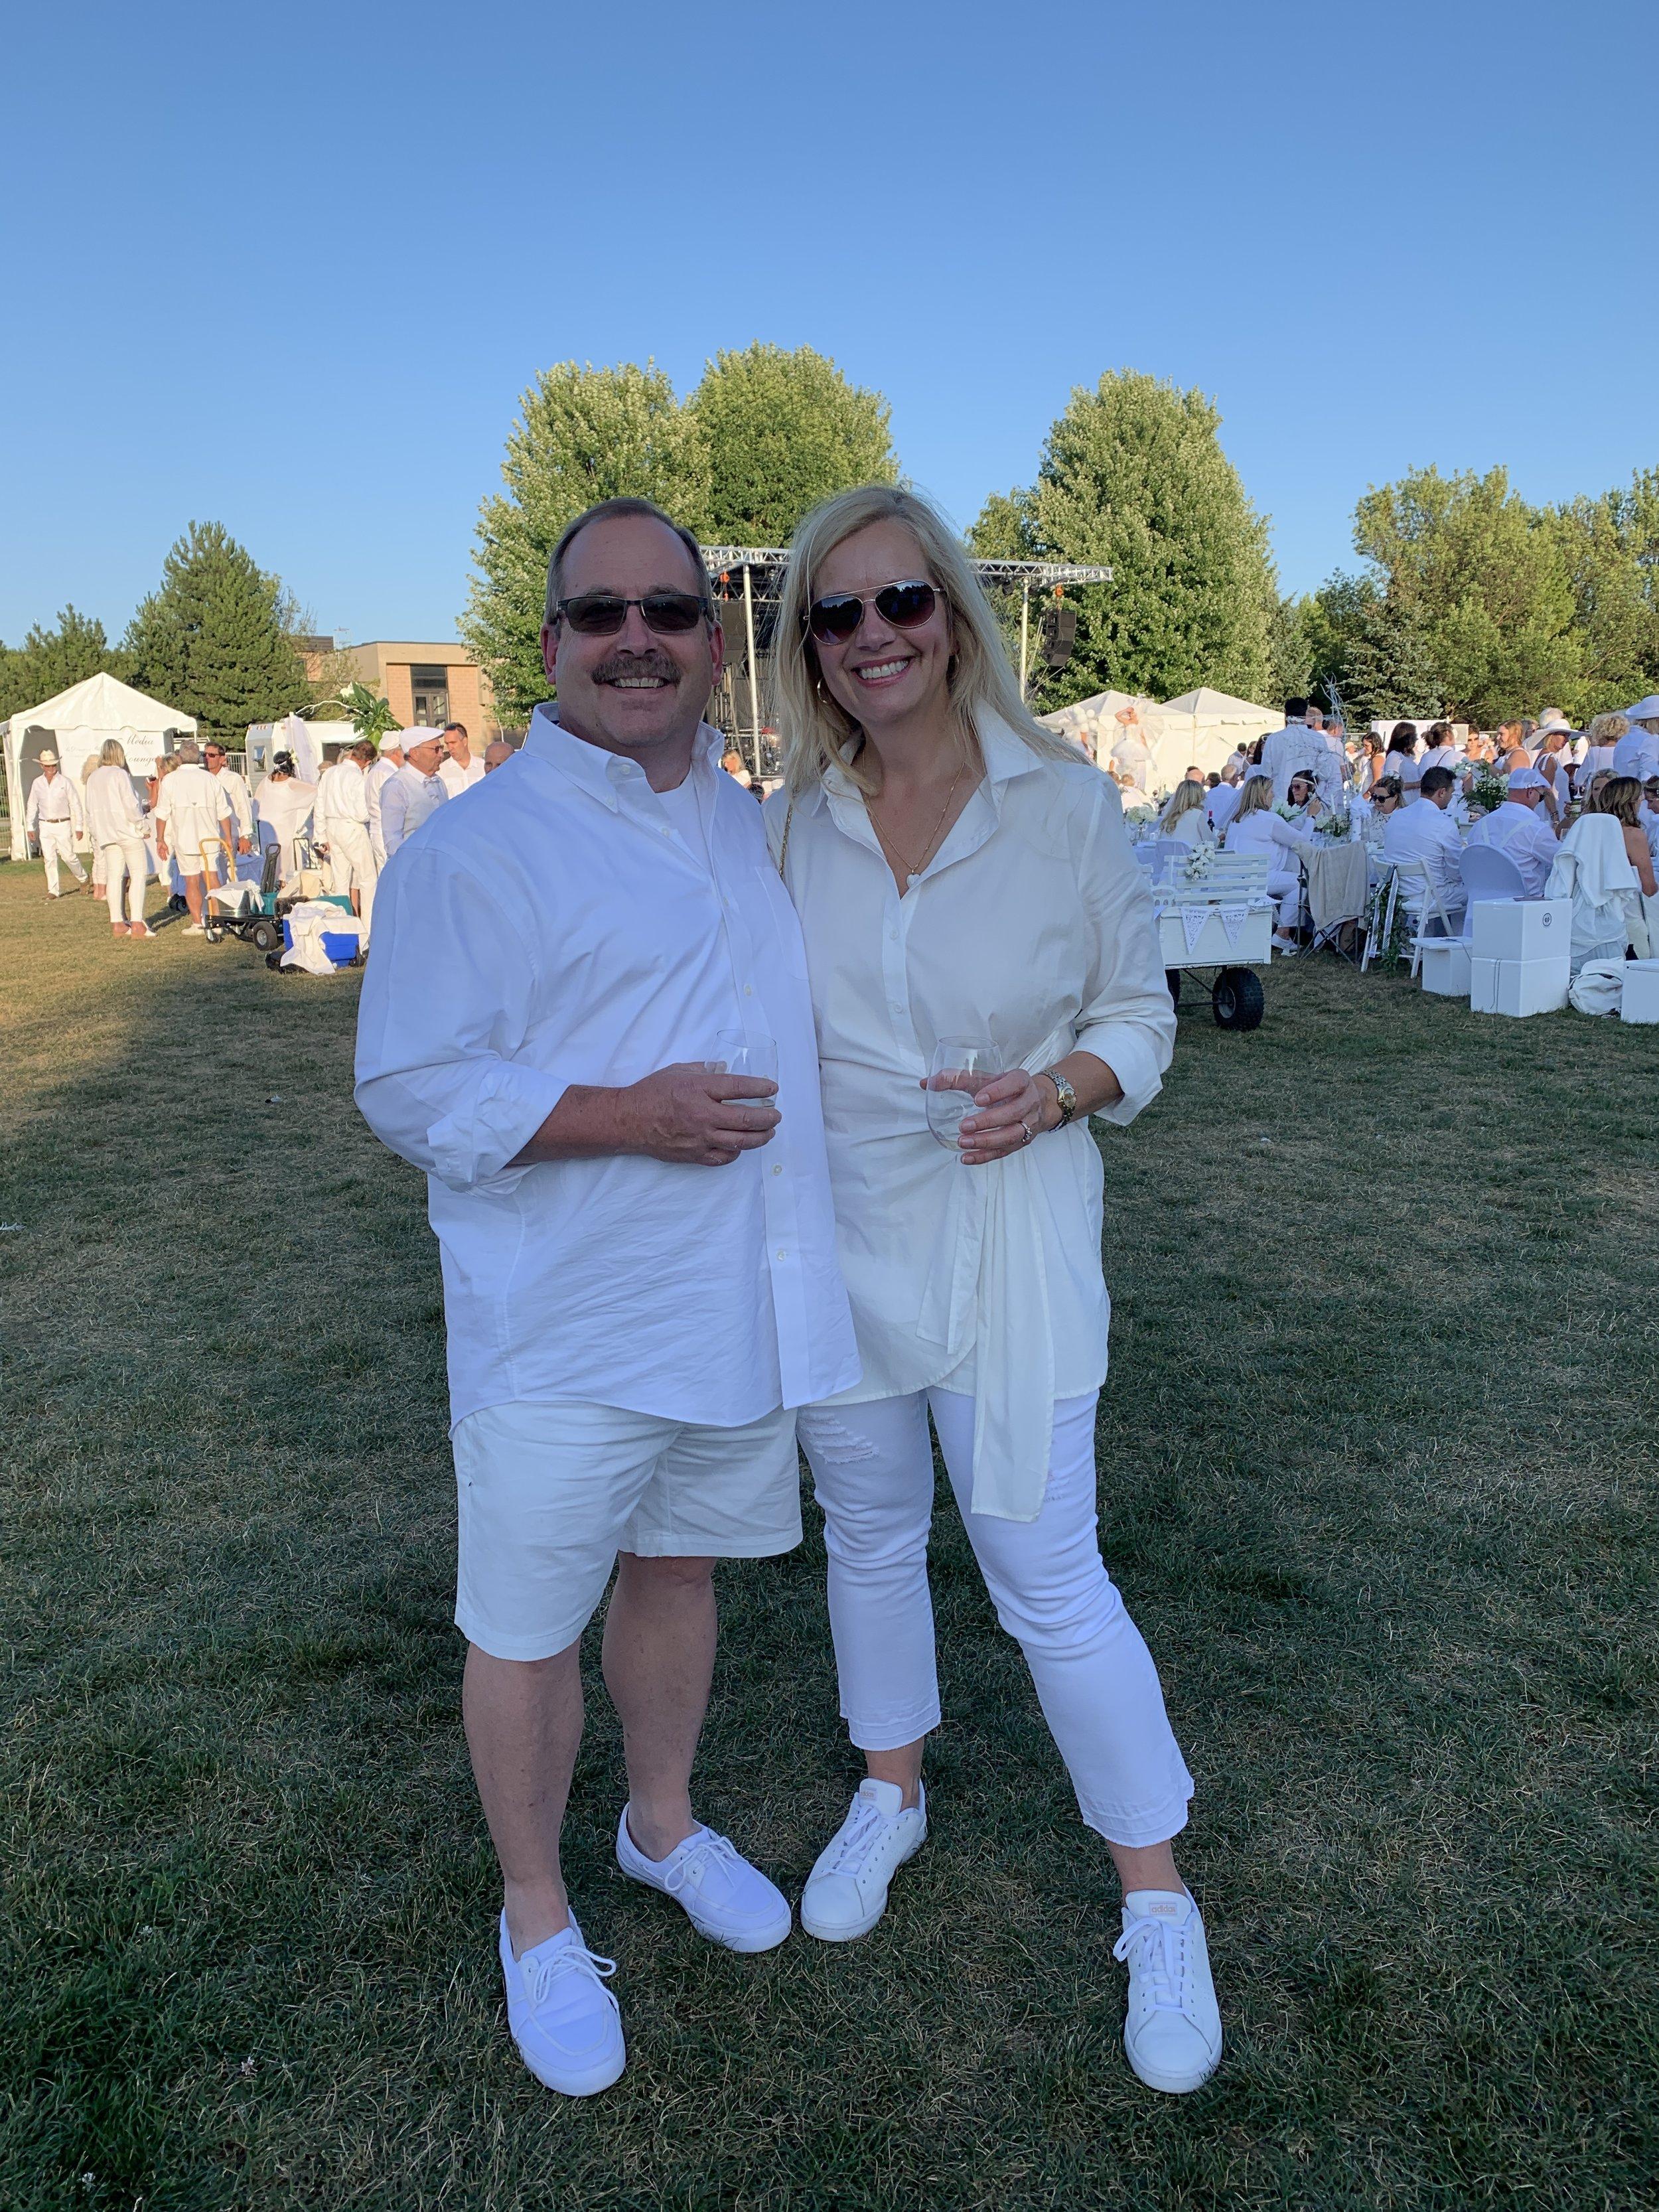 Dave and Anita Hearn